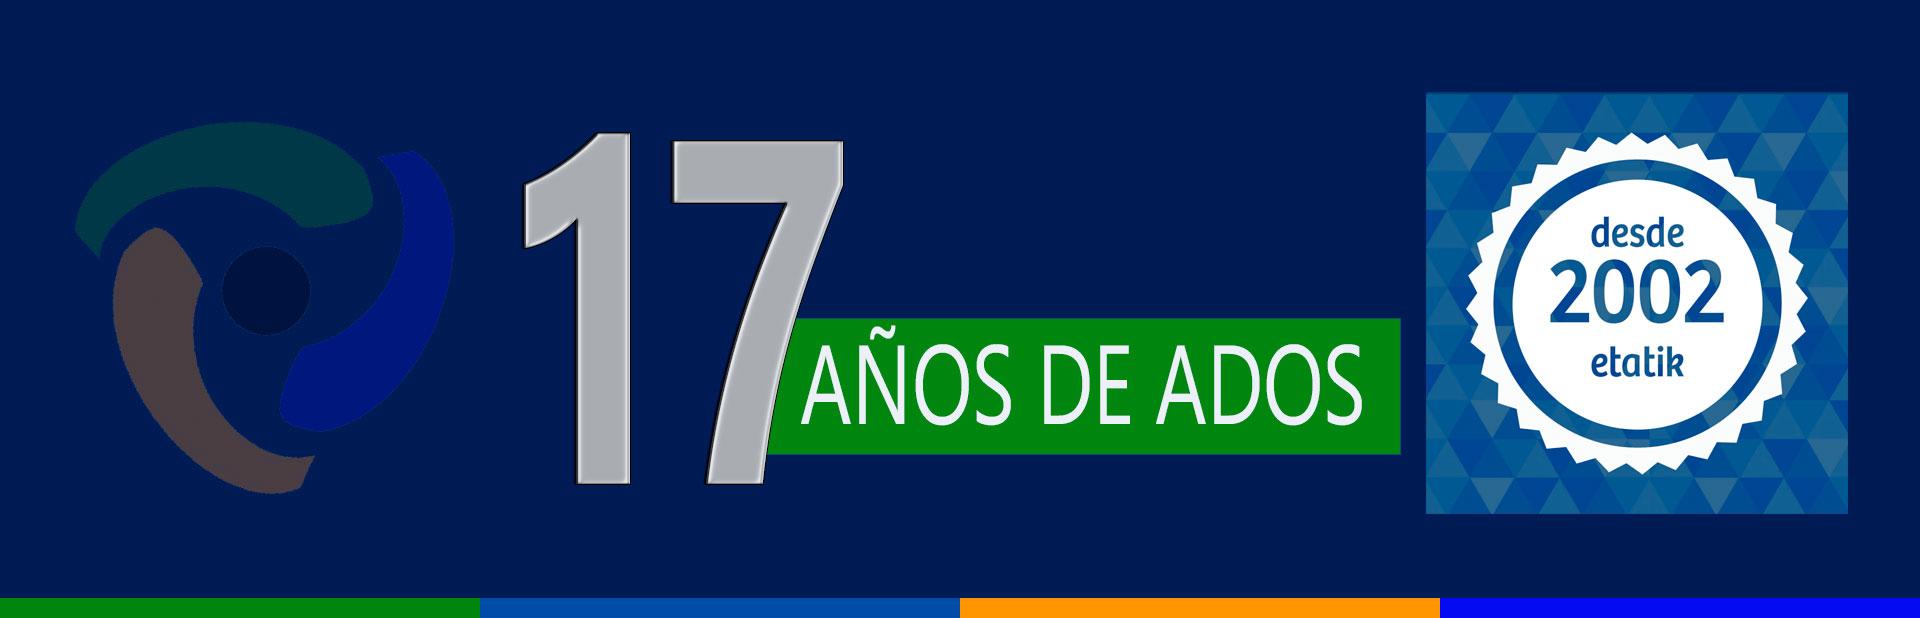 ADOS desde 2002